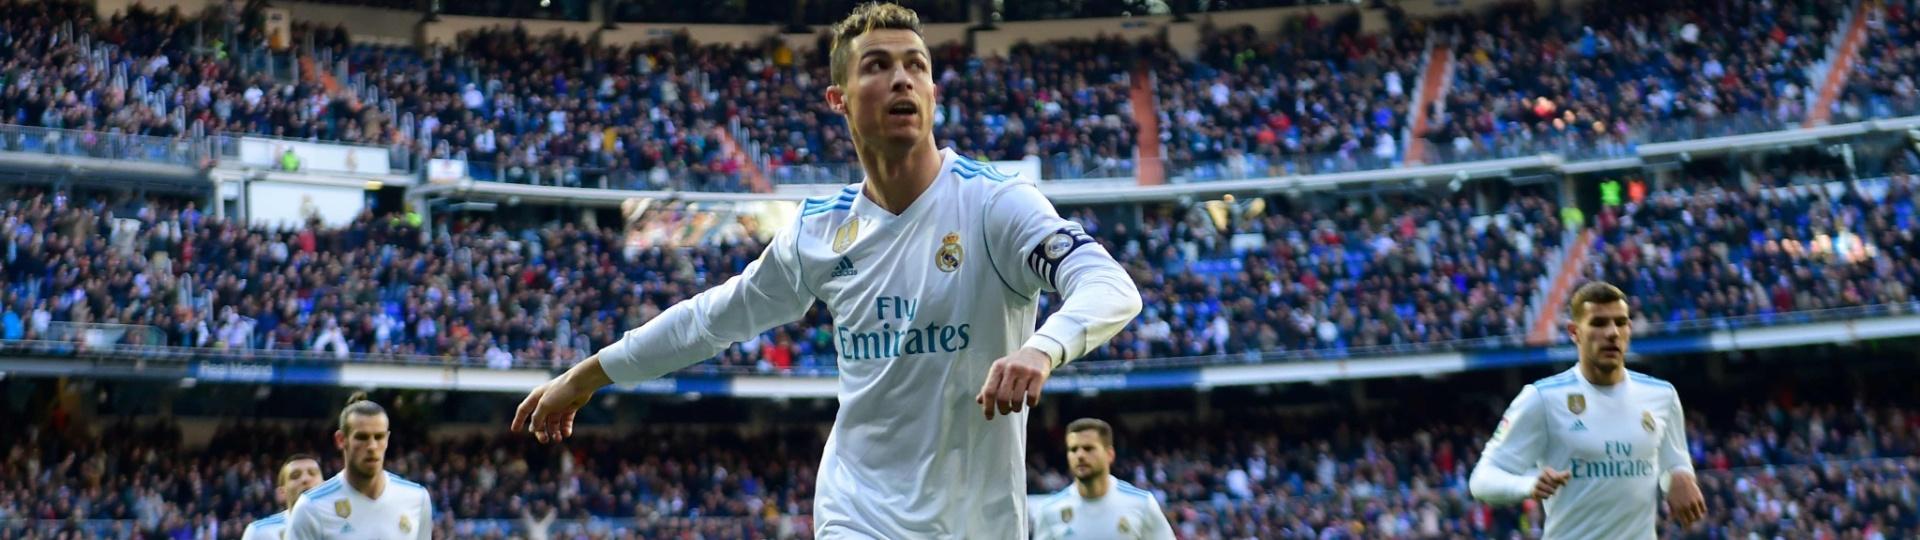 Cristiano Ronaldo comemora gol marcado para o Real Madrid contra o Alavés